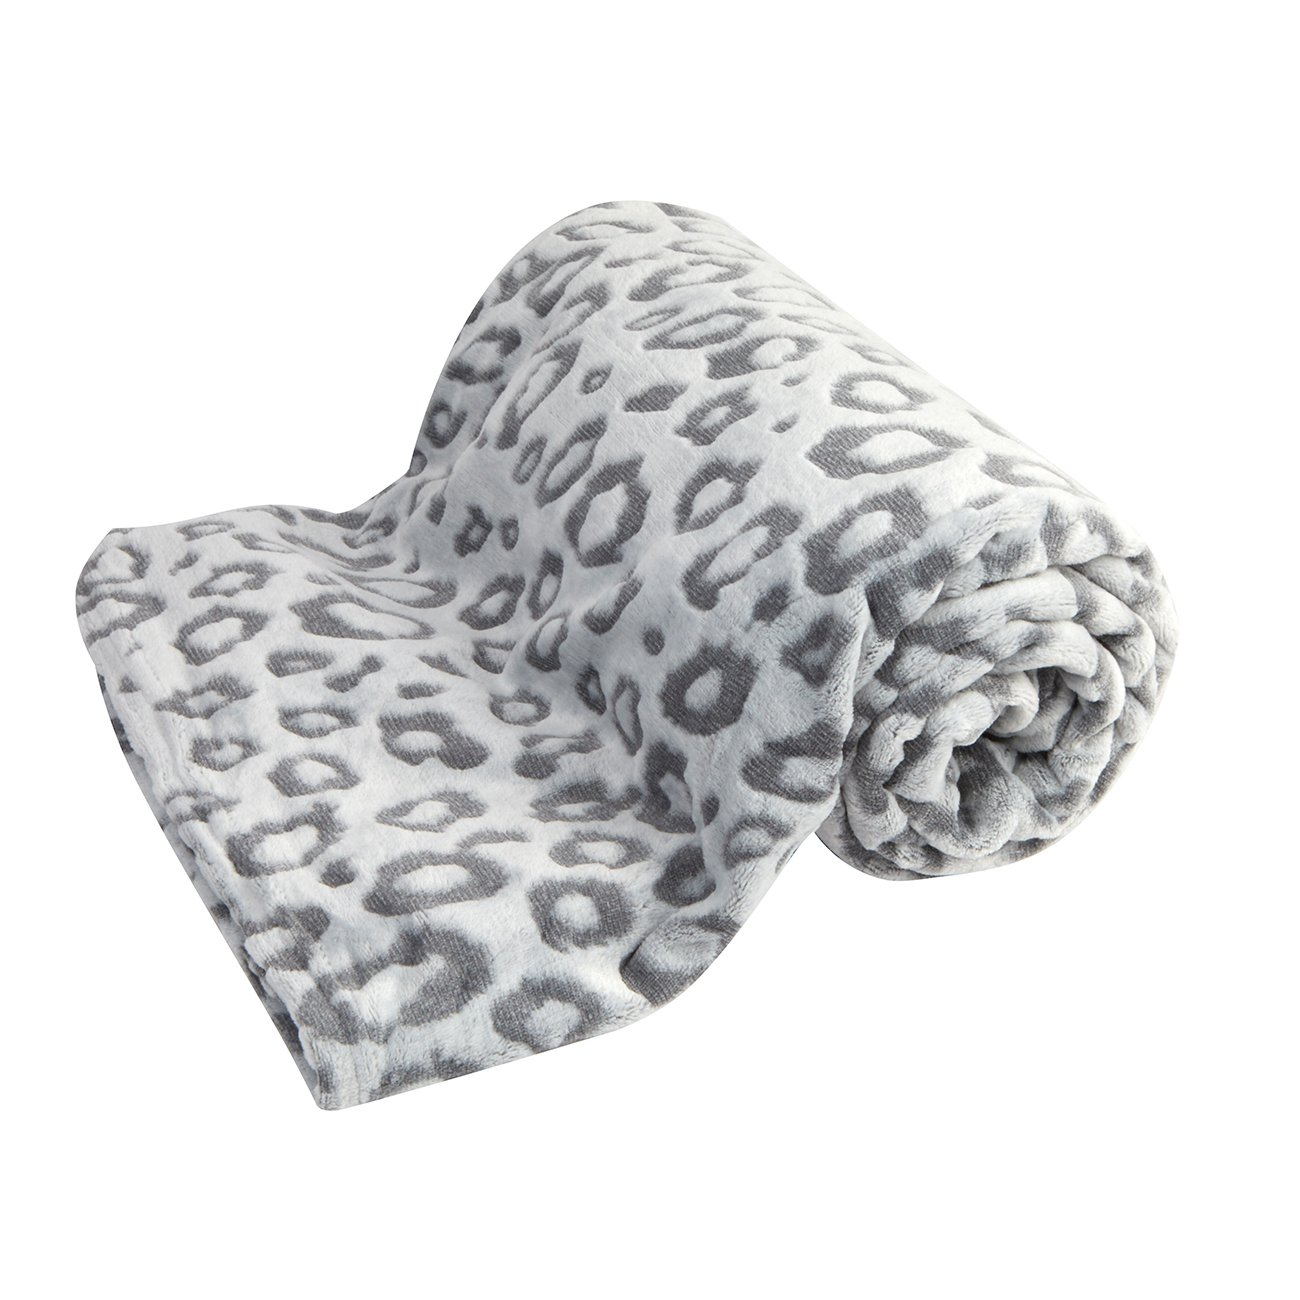 Forever Dreaming Home Essentials Fleece Animal Print Blanket Grey Leopard